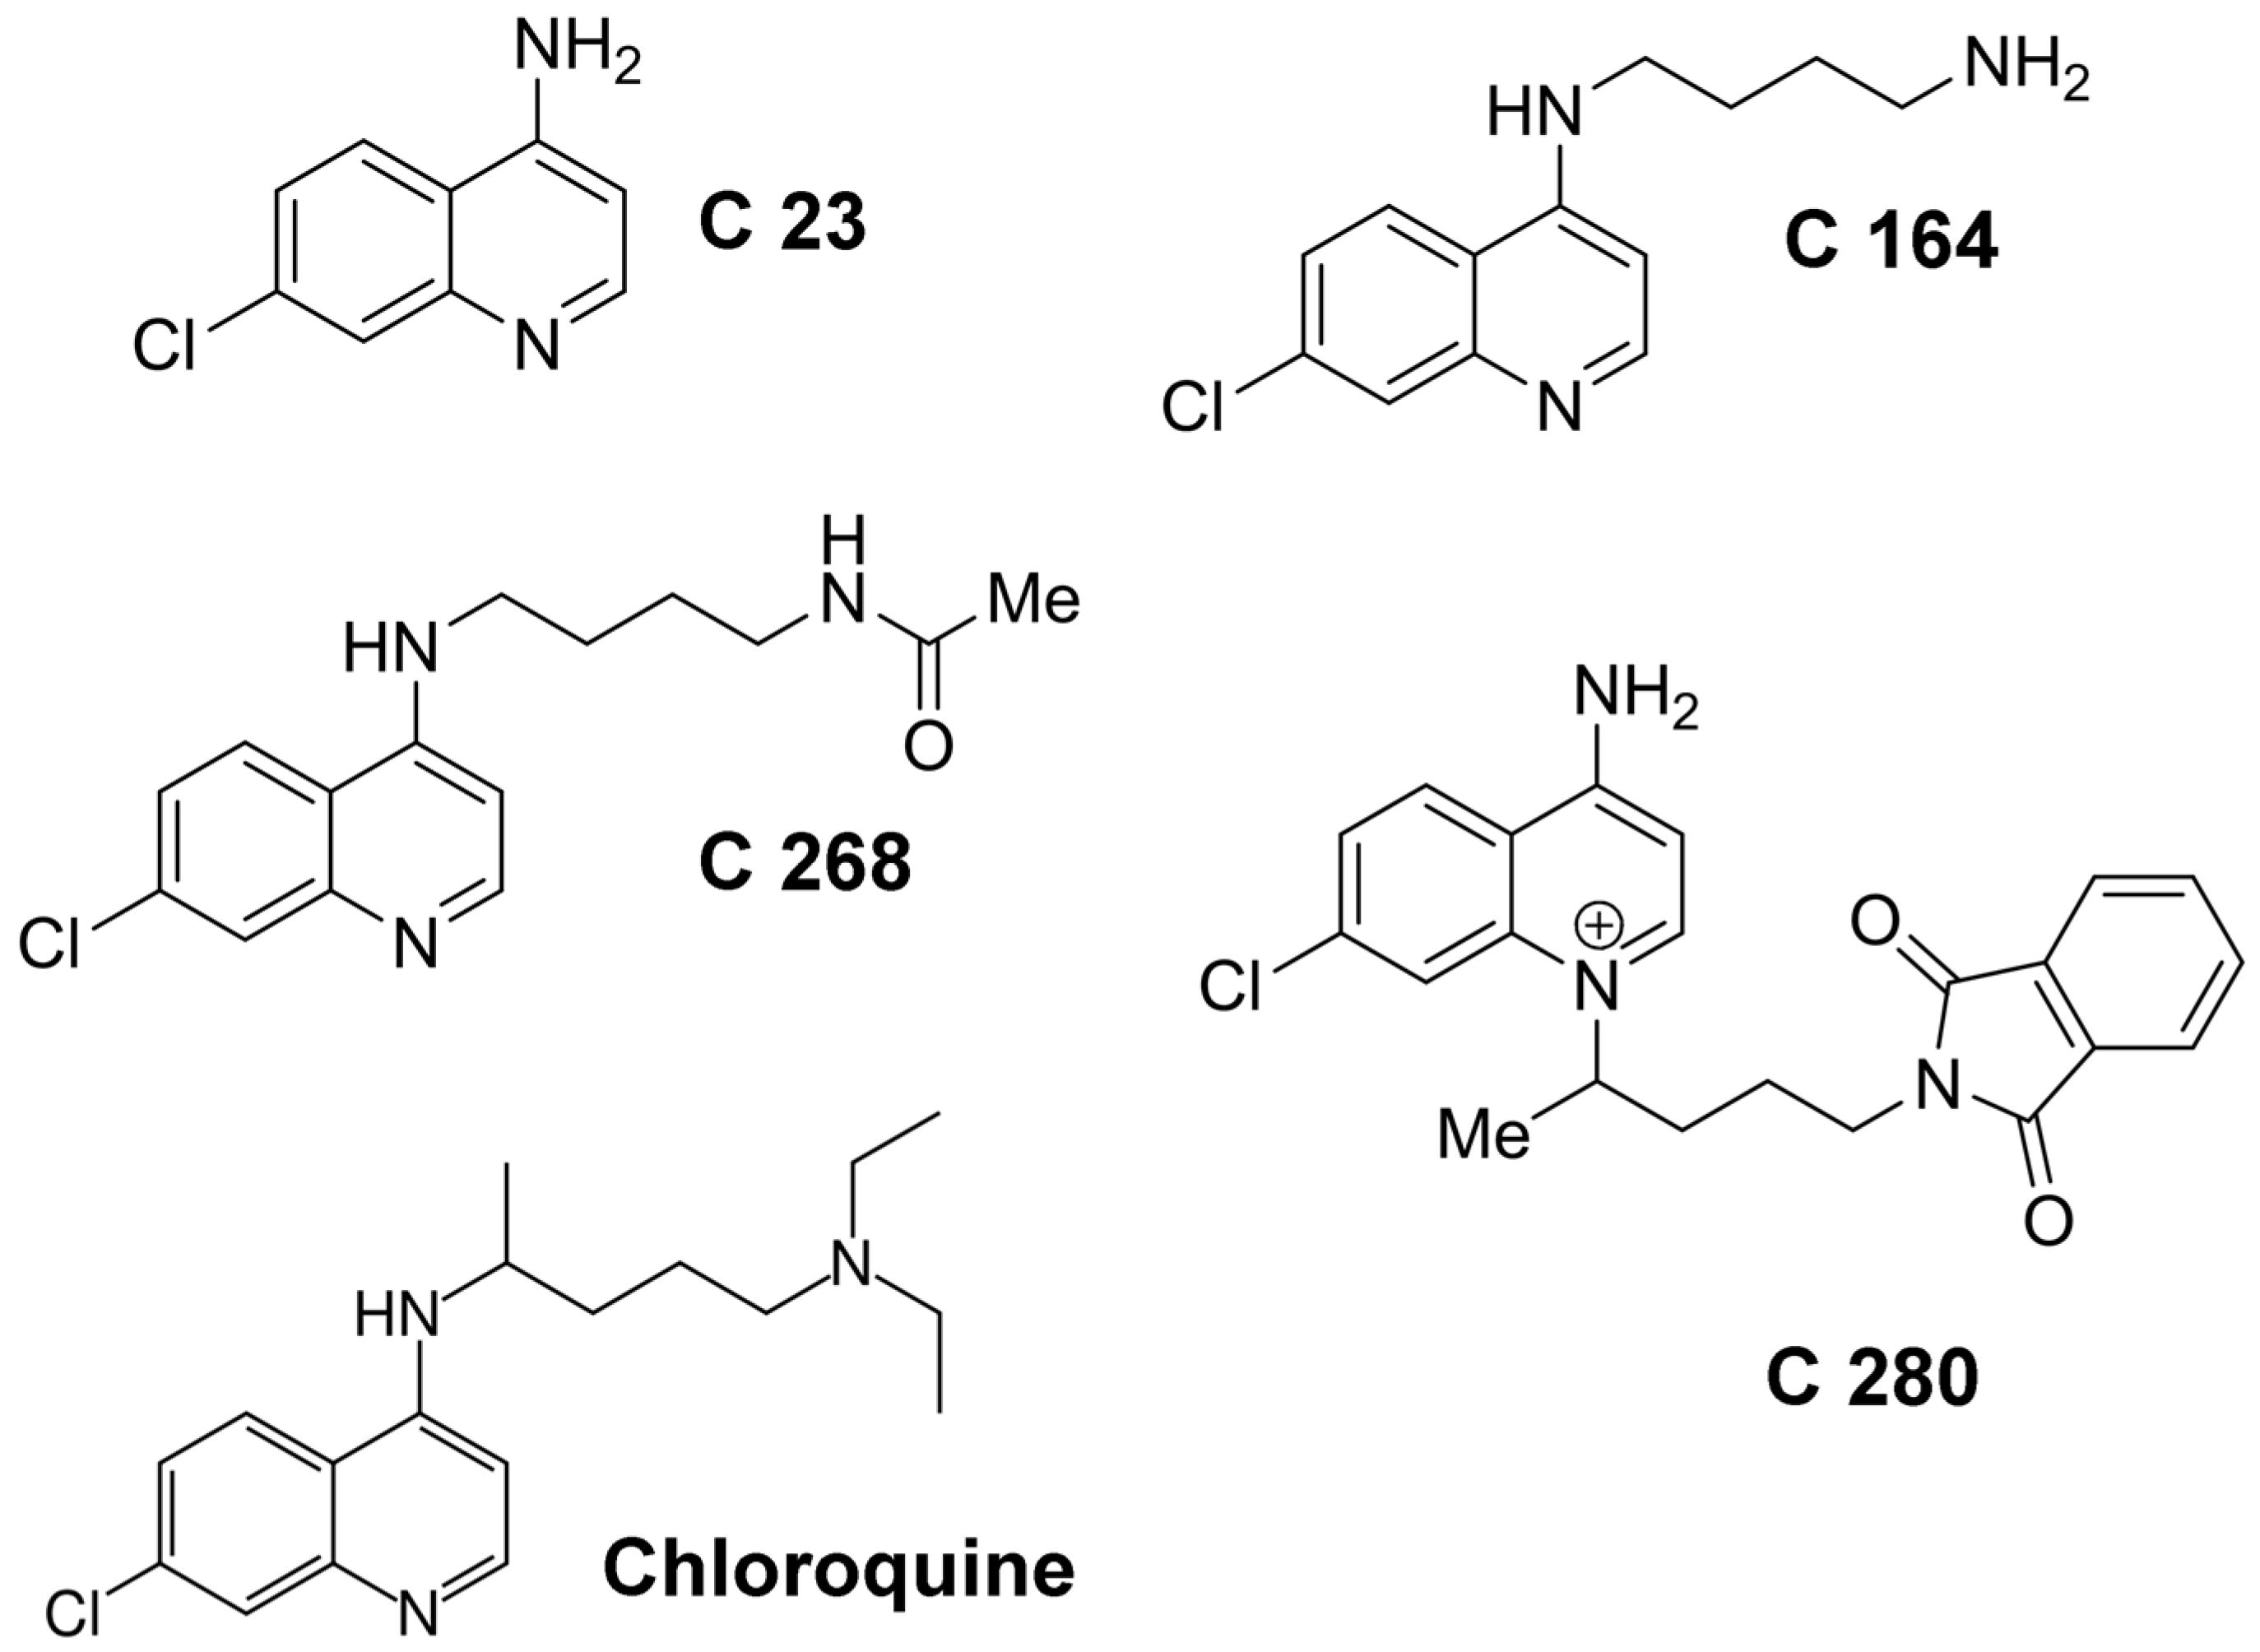 hydrochlorothiazide monograph usp